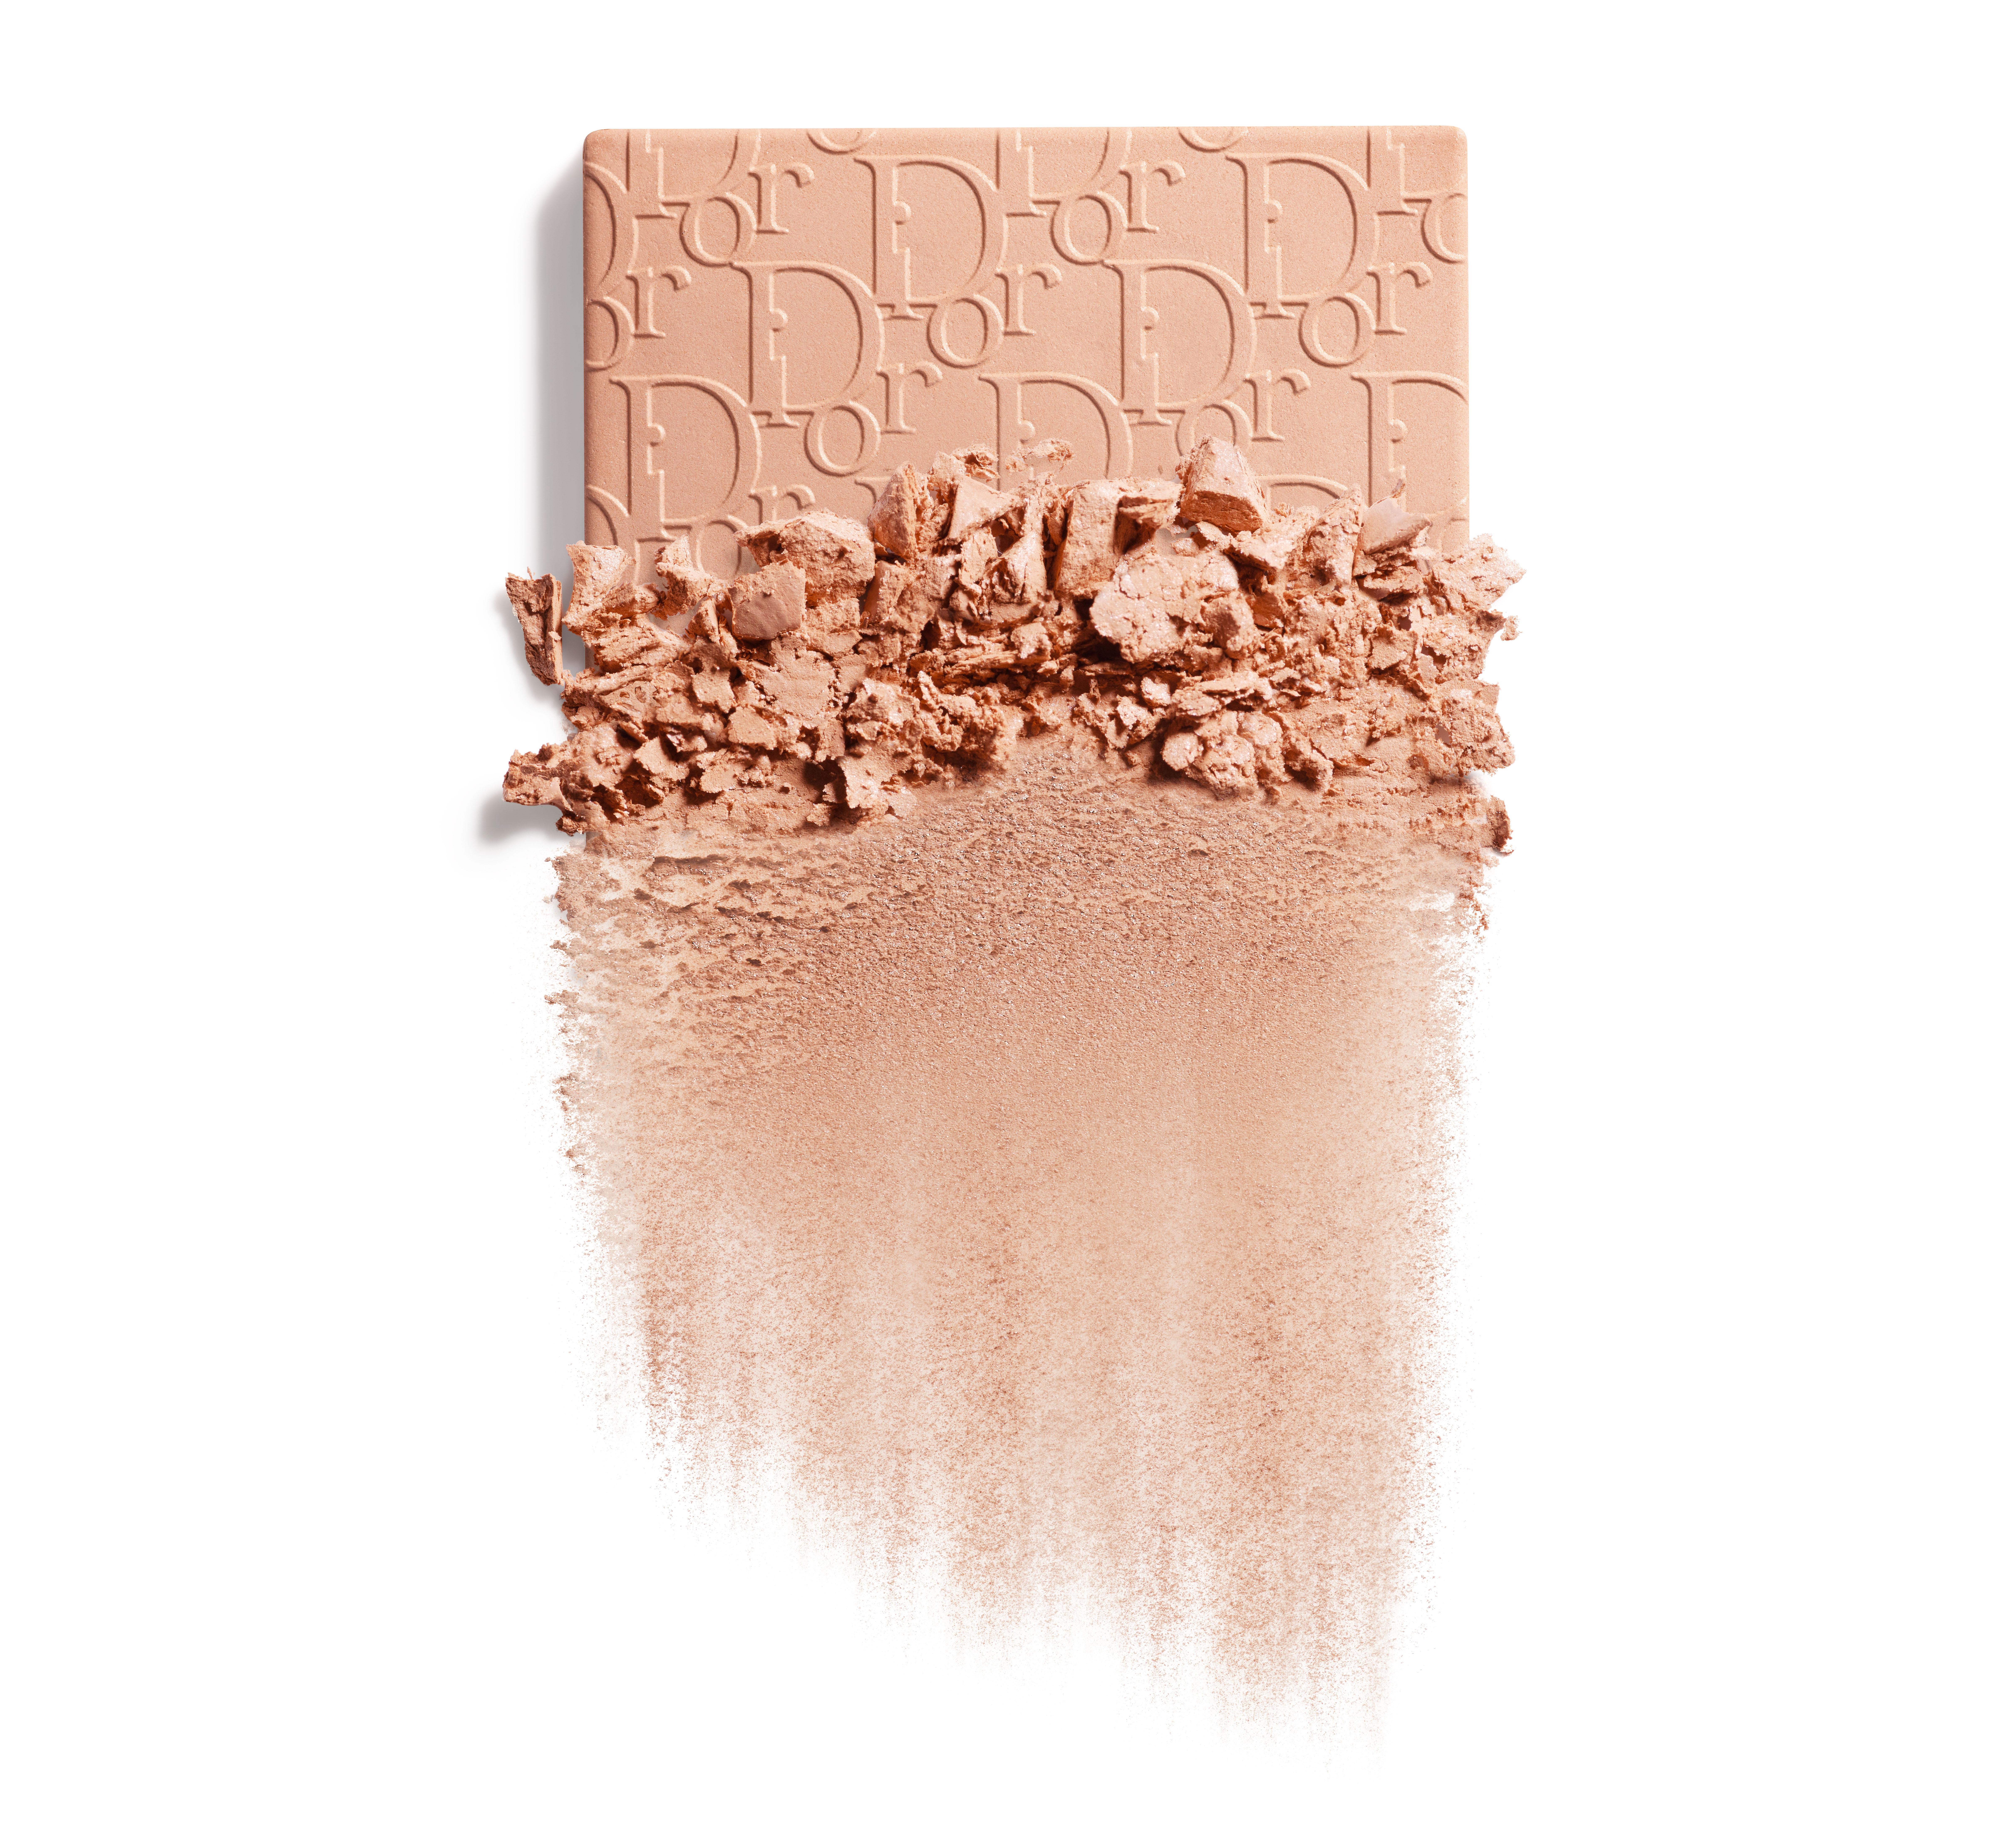 DIOR Backstage Face & Body Powder-No-Powder, 3 neutral